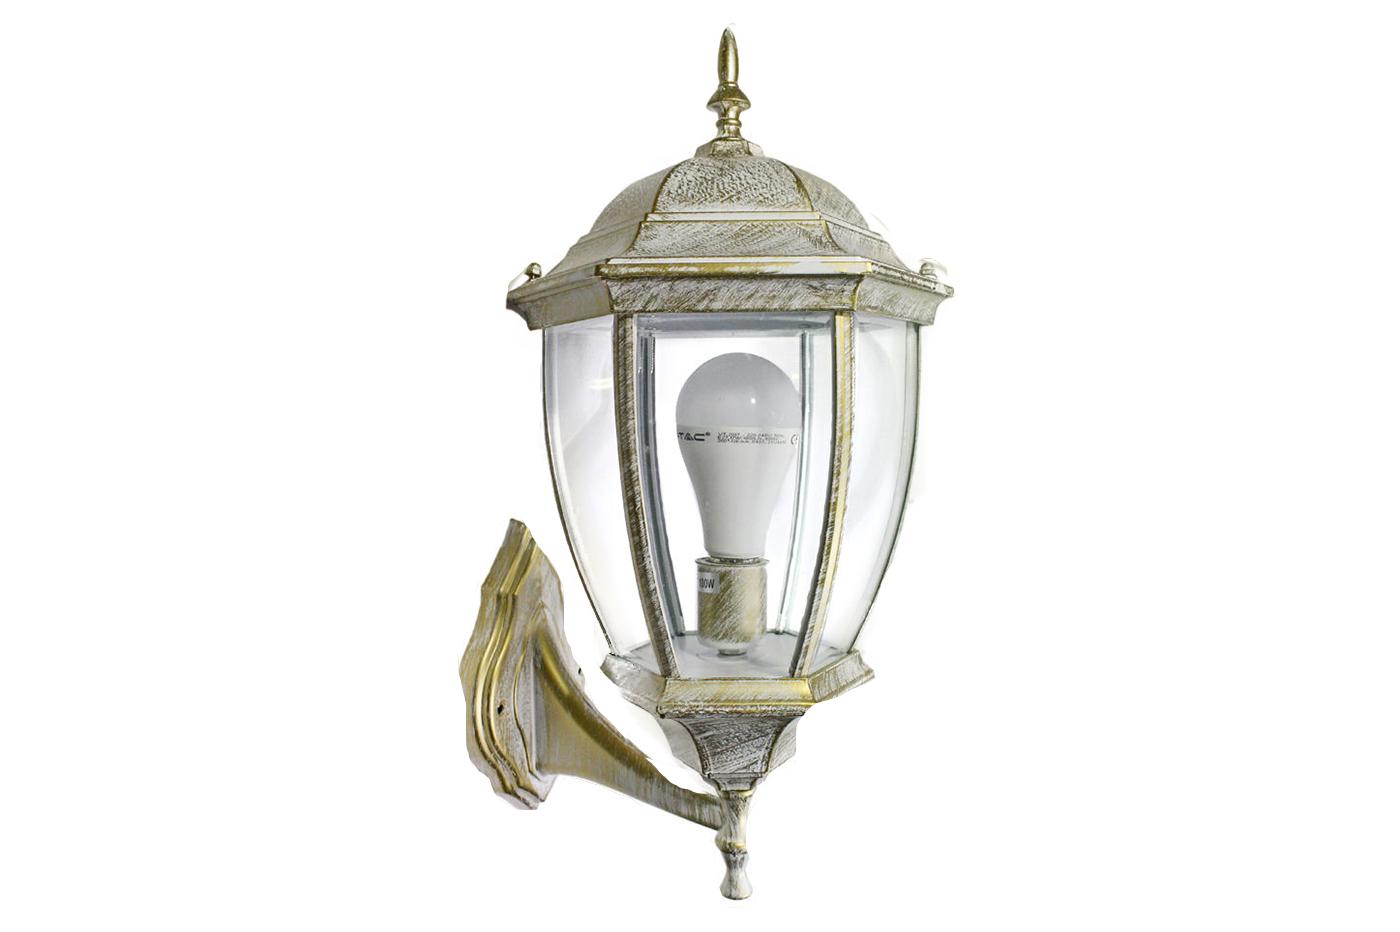 Applique lampada lanterna vintage parete esterno impermeabile 60w